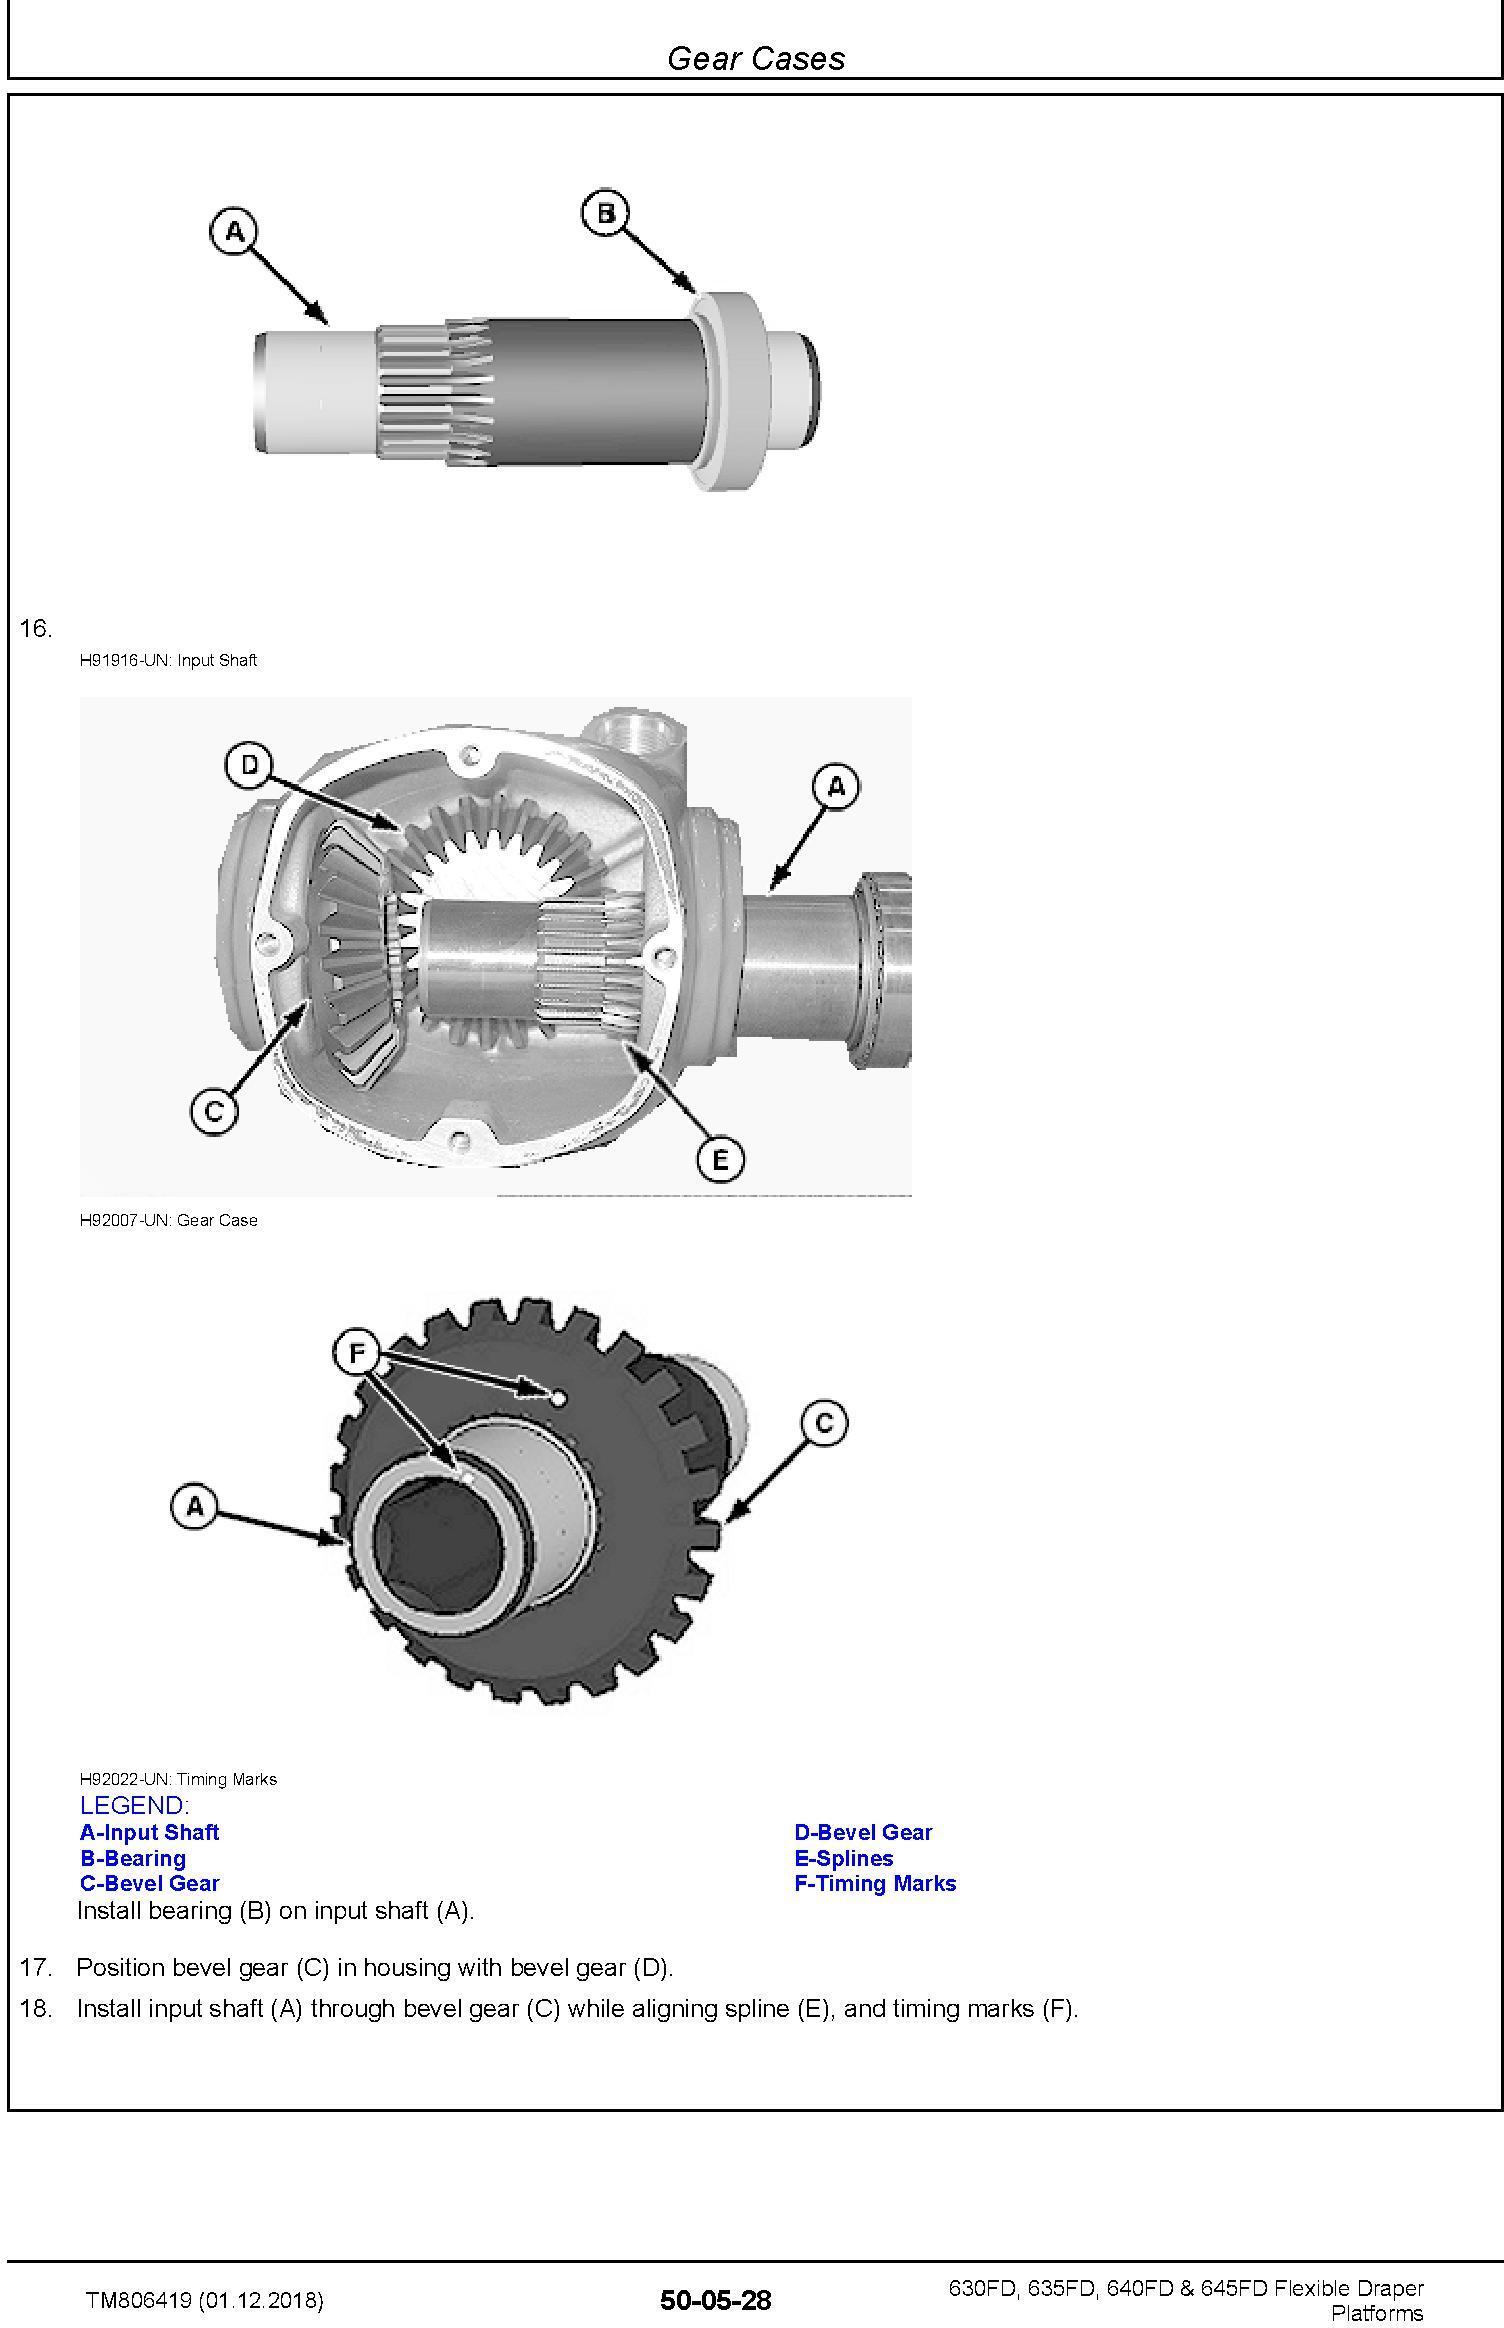 John Deere 630FD, 635FD, 640FD, 645FD Flexible Draper Platform (SN.120100-) Repair Manual (TM806419) - 3